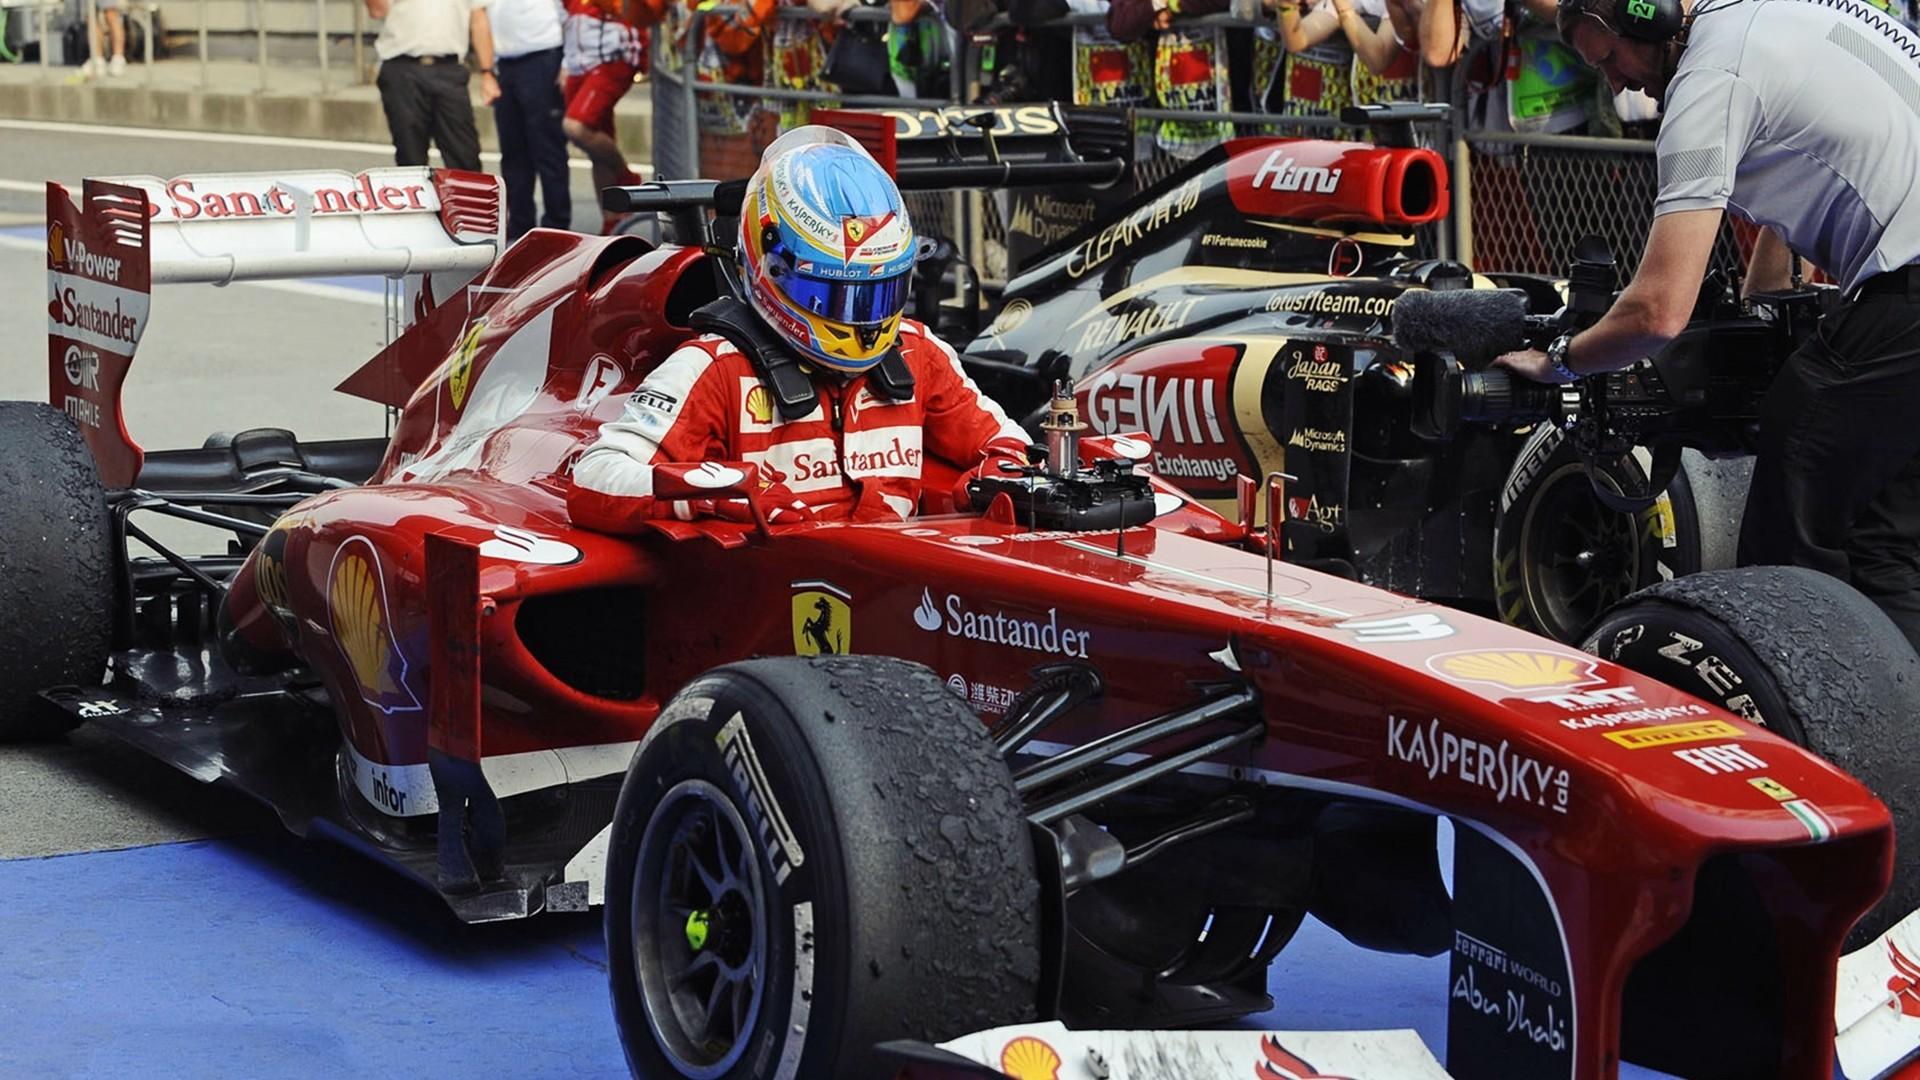 Wallpaper 1920x1080 Px Fernando Alonso Ferrari Formula